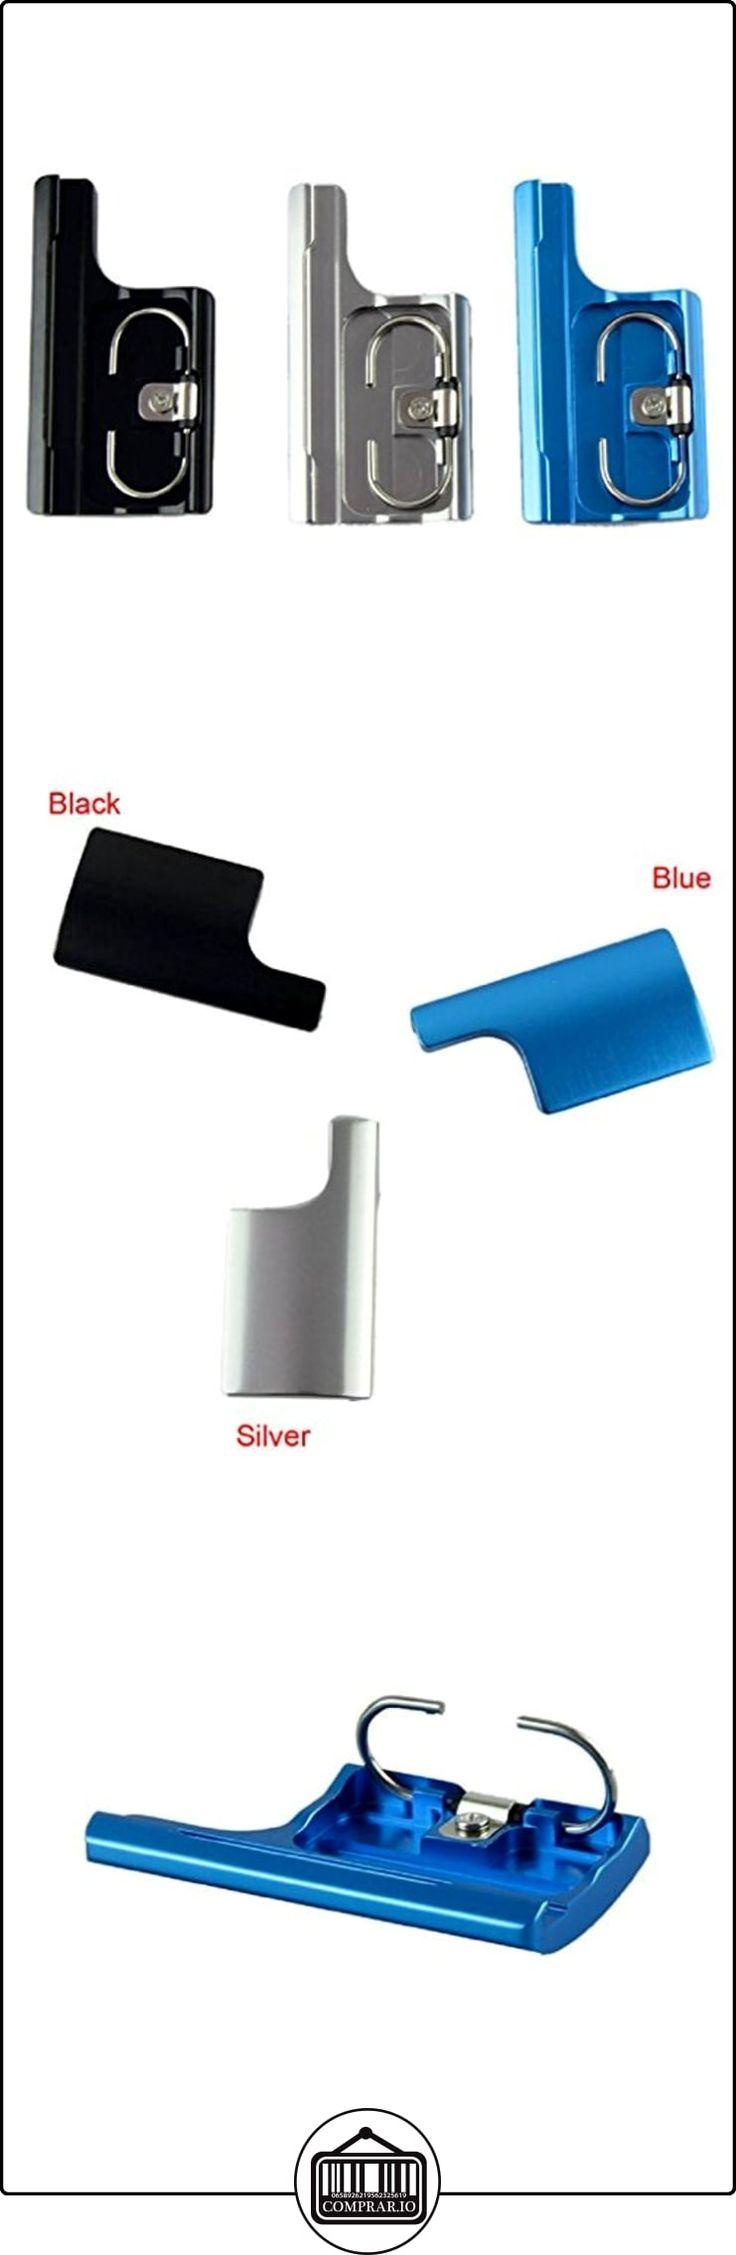 Koly Bebé Bloqueo para cajón de la puerta Bloqueo de cubierta impermeable (Azul)  ✿ Seguridad para tu bebé - (Protege a tus hijos) ✿ ▬► Ver oferta: http://comprar.io/goto/B01BTSAGQY